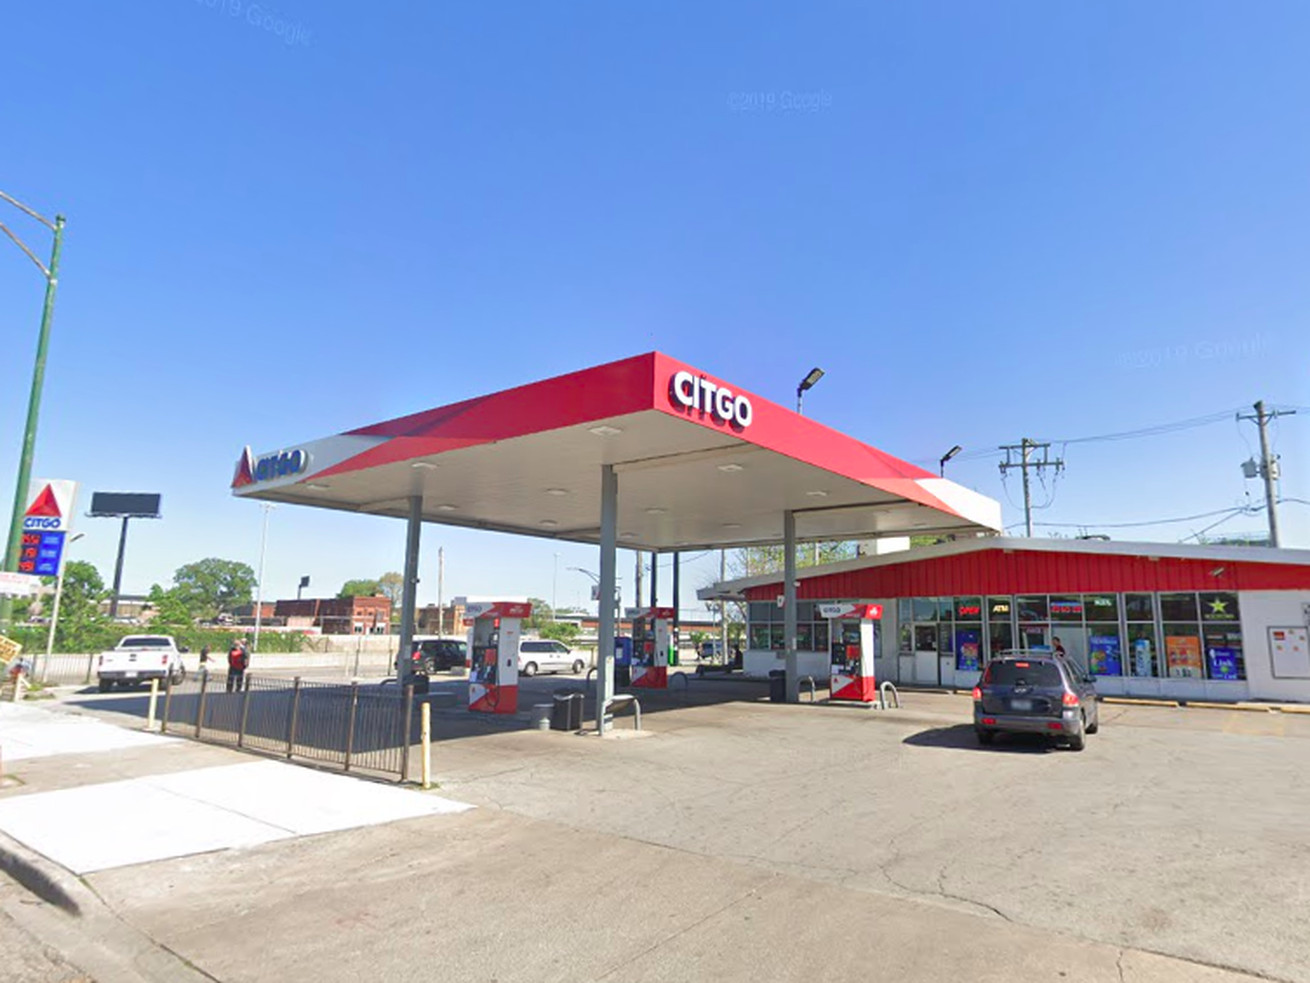 Citgo gas station, 251 W. 63rd St.